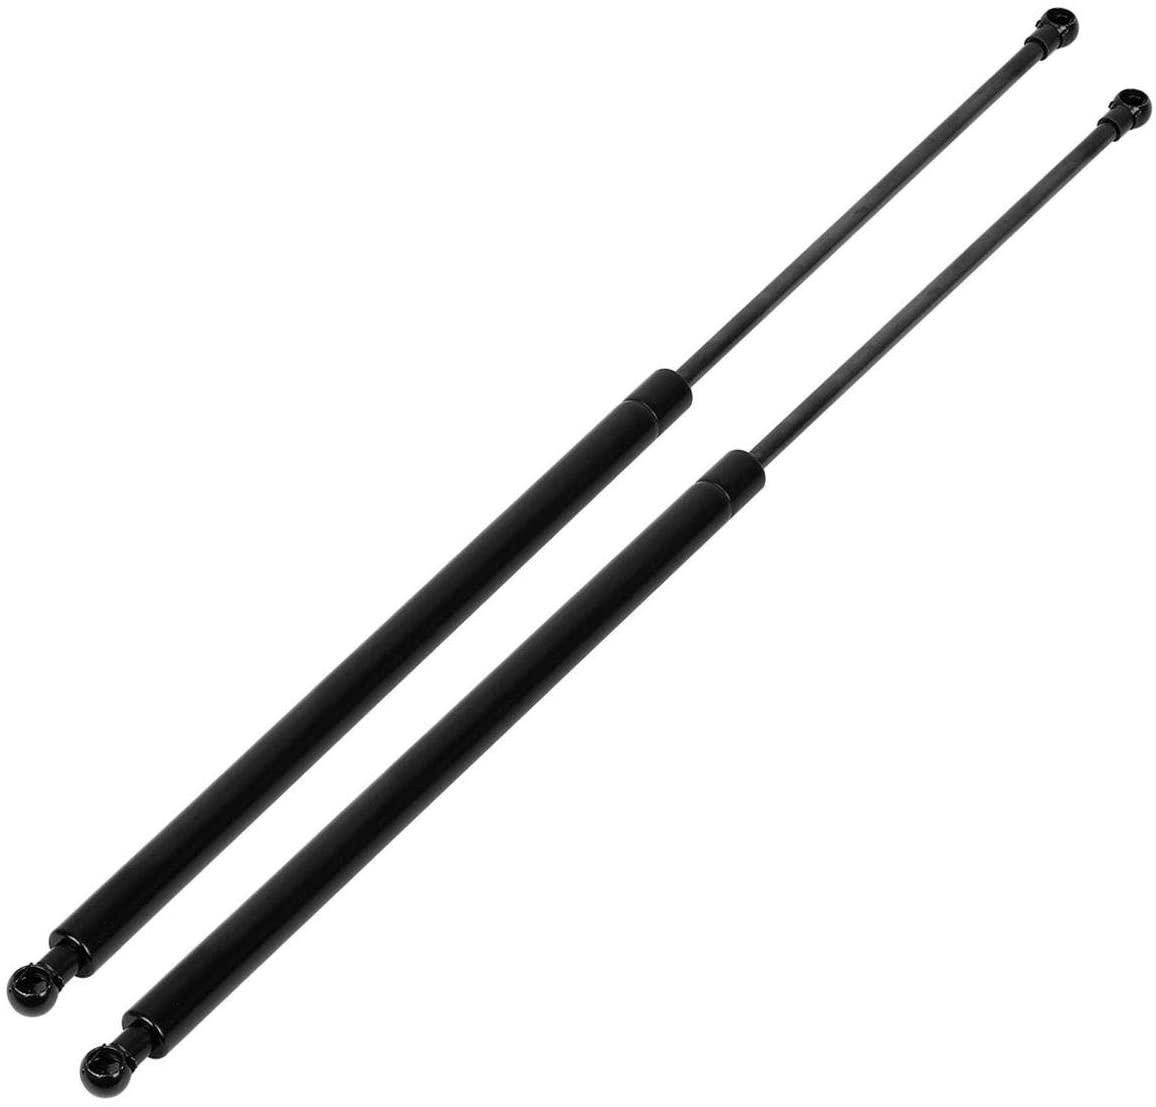 Maxpow Qty2 4568 SE1200M80PS100 8196319 Tonneau Cover Struts Lift Supports 29.49